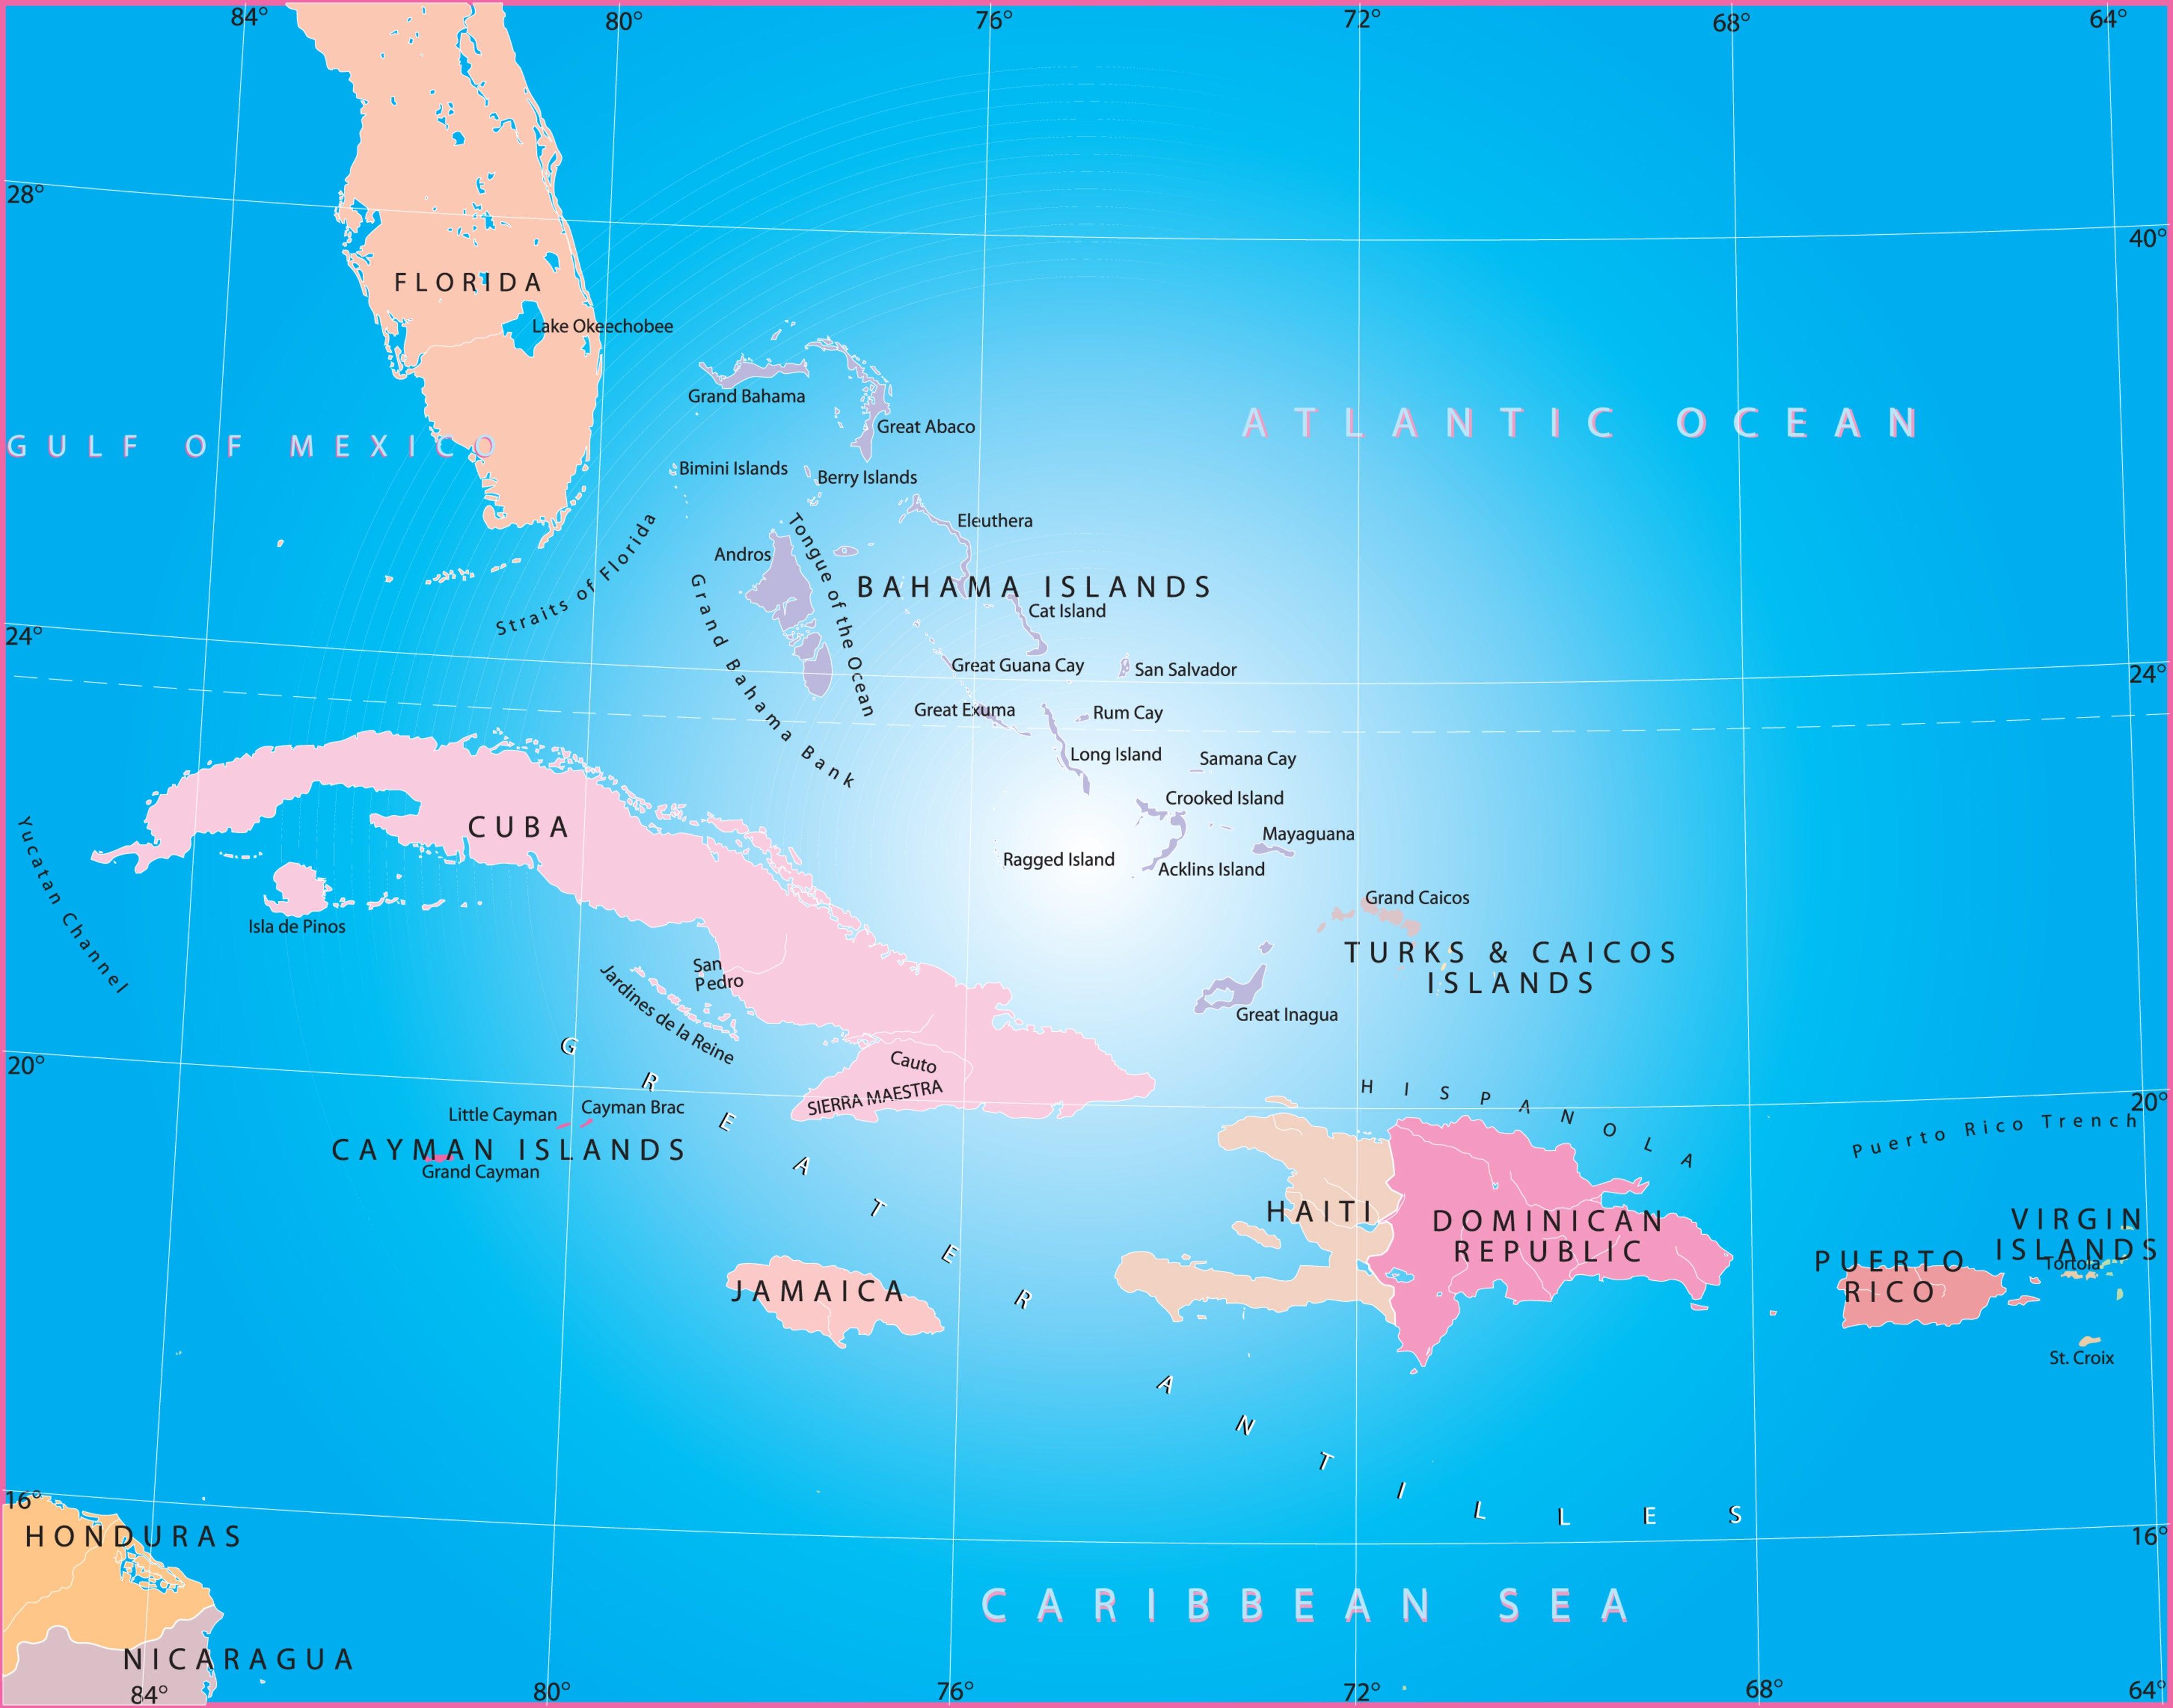 CARICOM busca avanzar hacia un Mercado Común